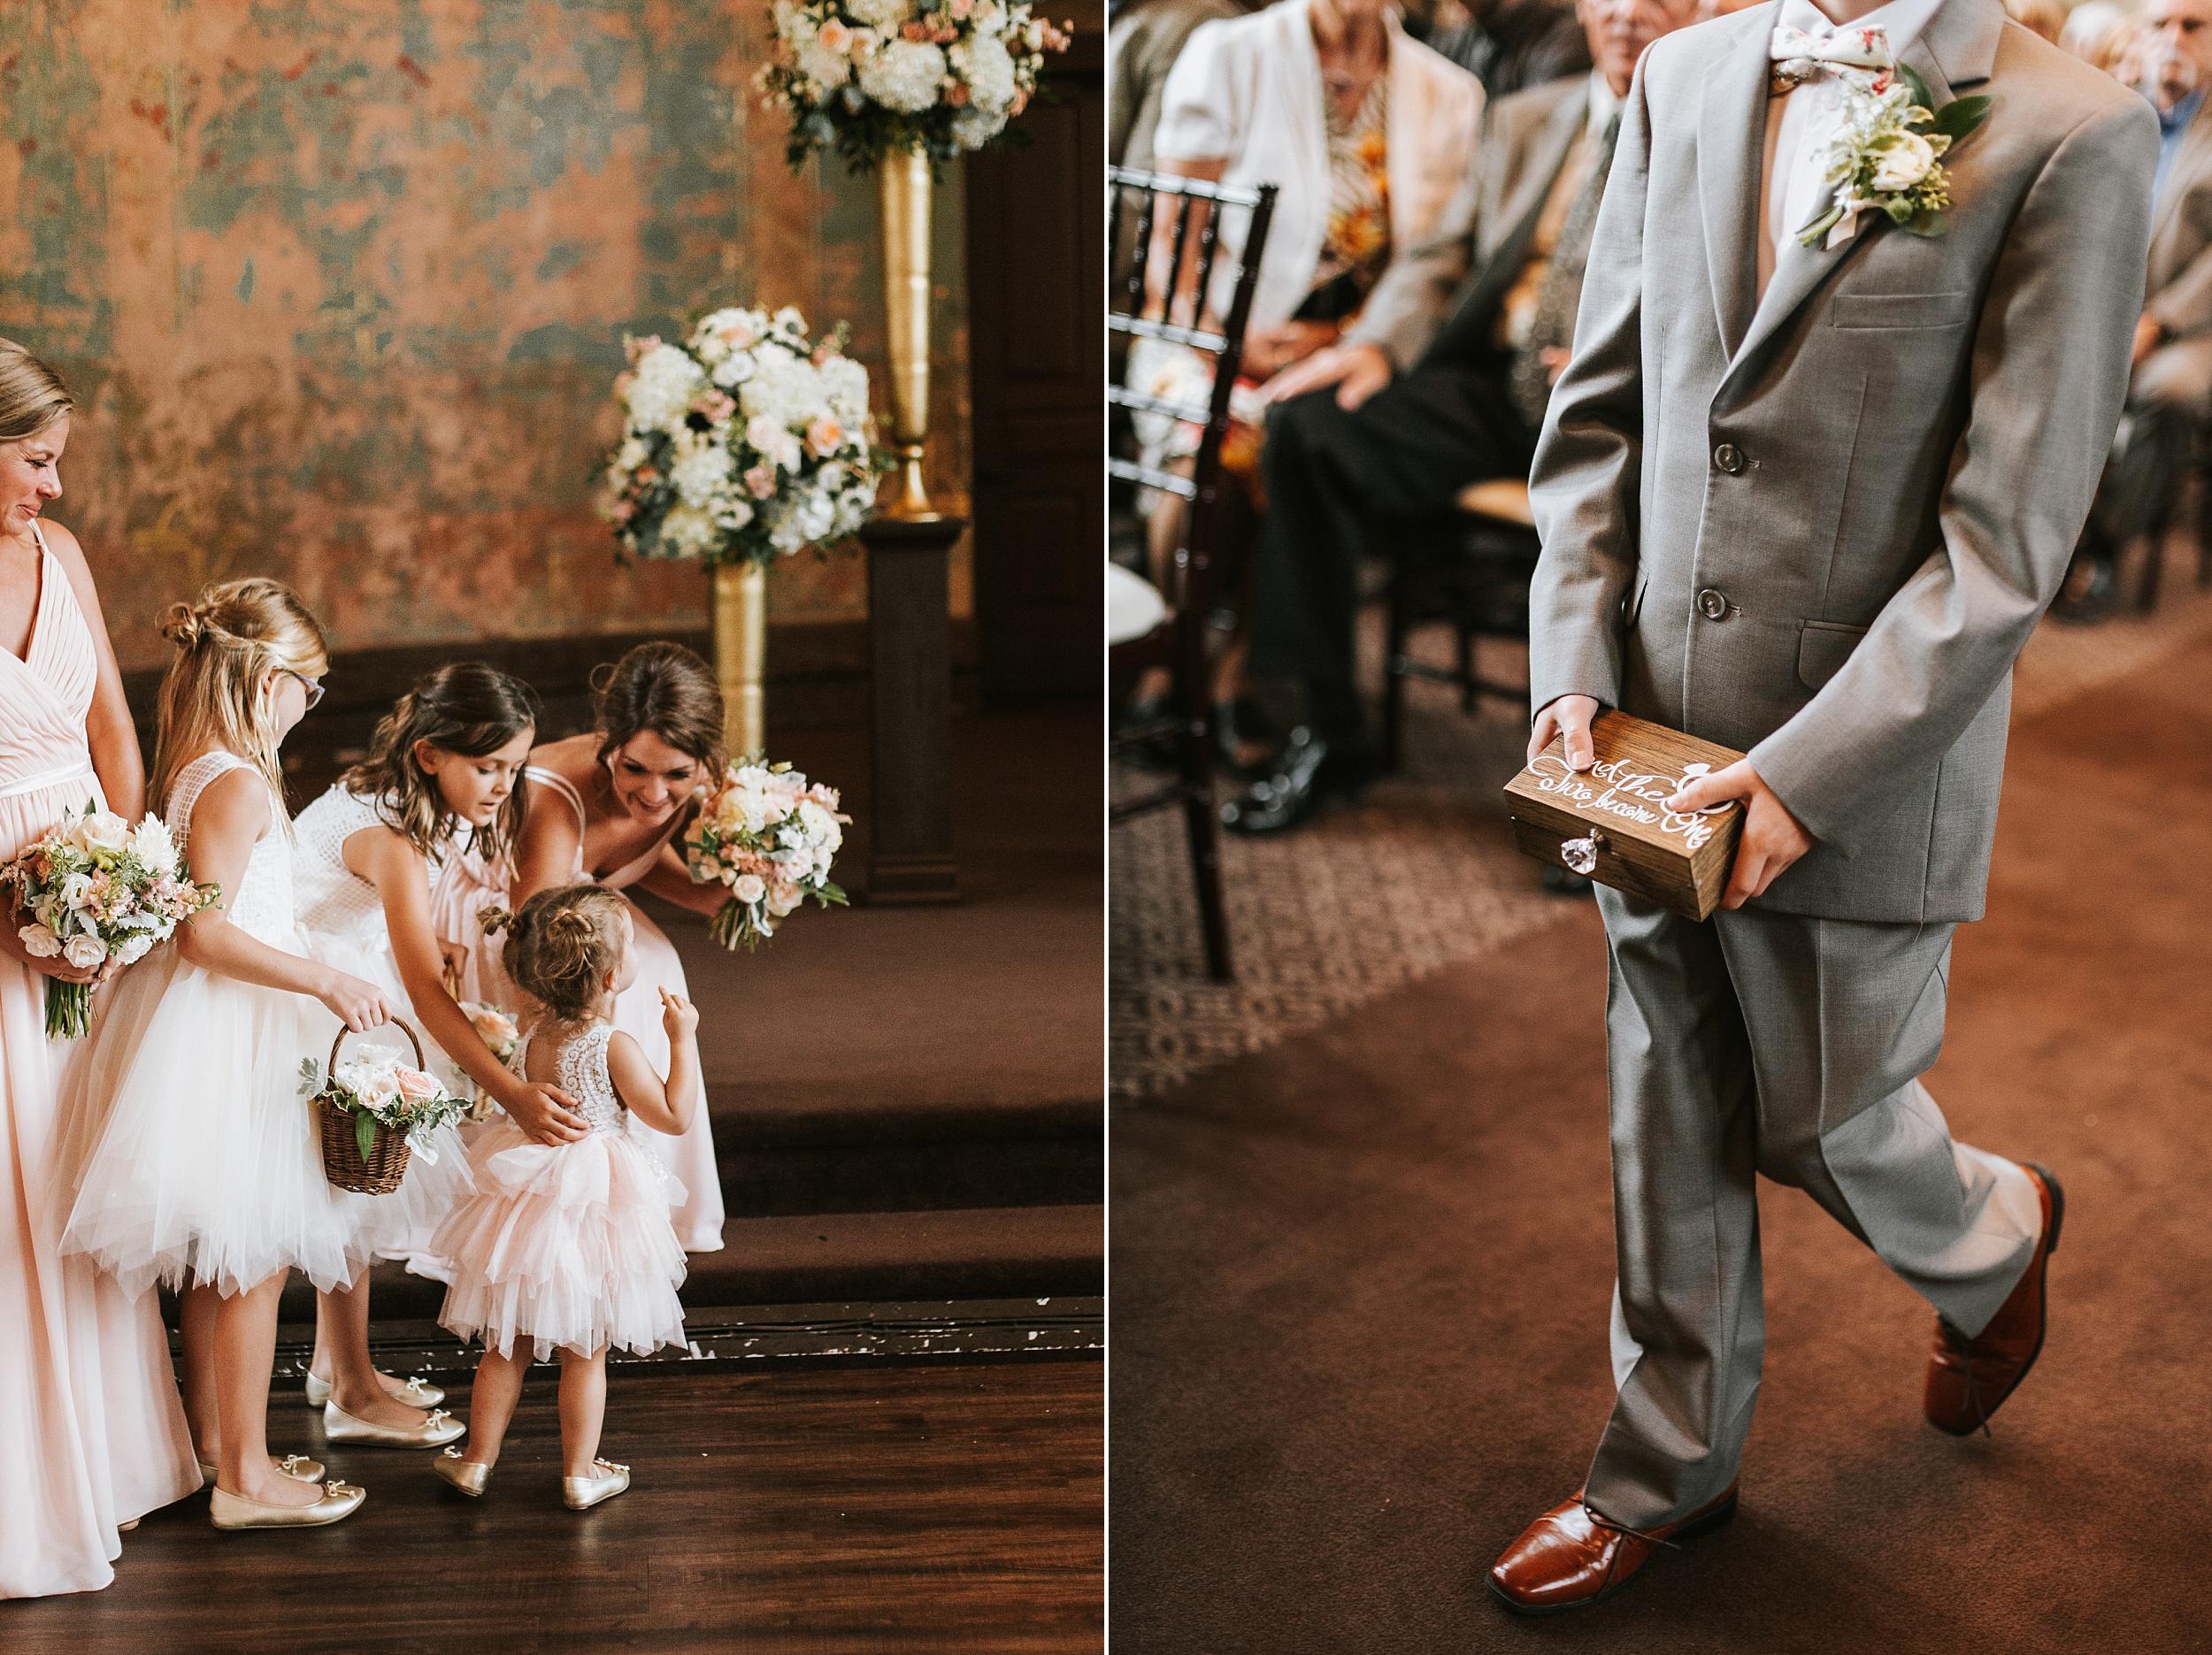 Brooke Townsend Photography - Cincinnati Wedding Photographer (104 of 170).jpg